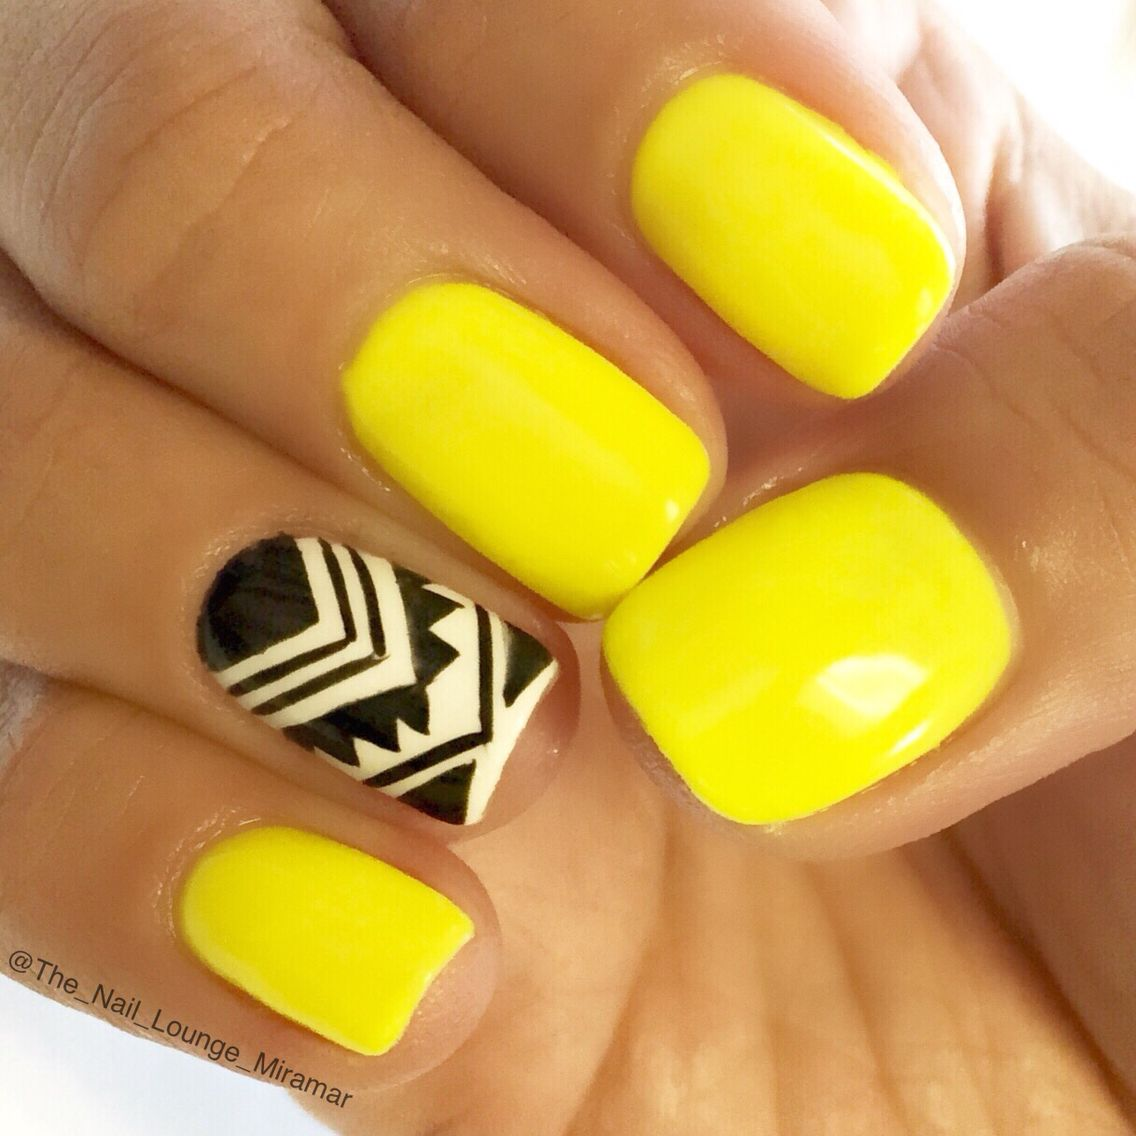 Tribal nail art design | Nail Art | Pinterest | Uñas verano y Verano